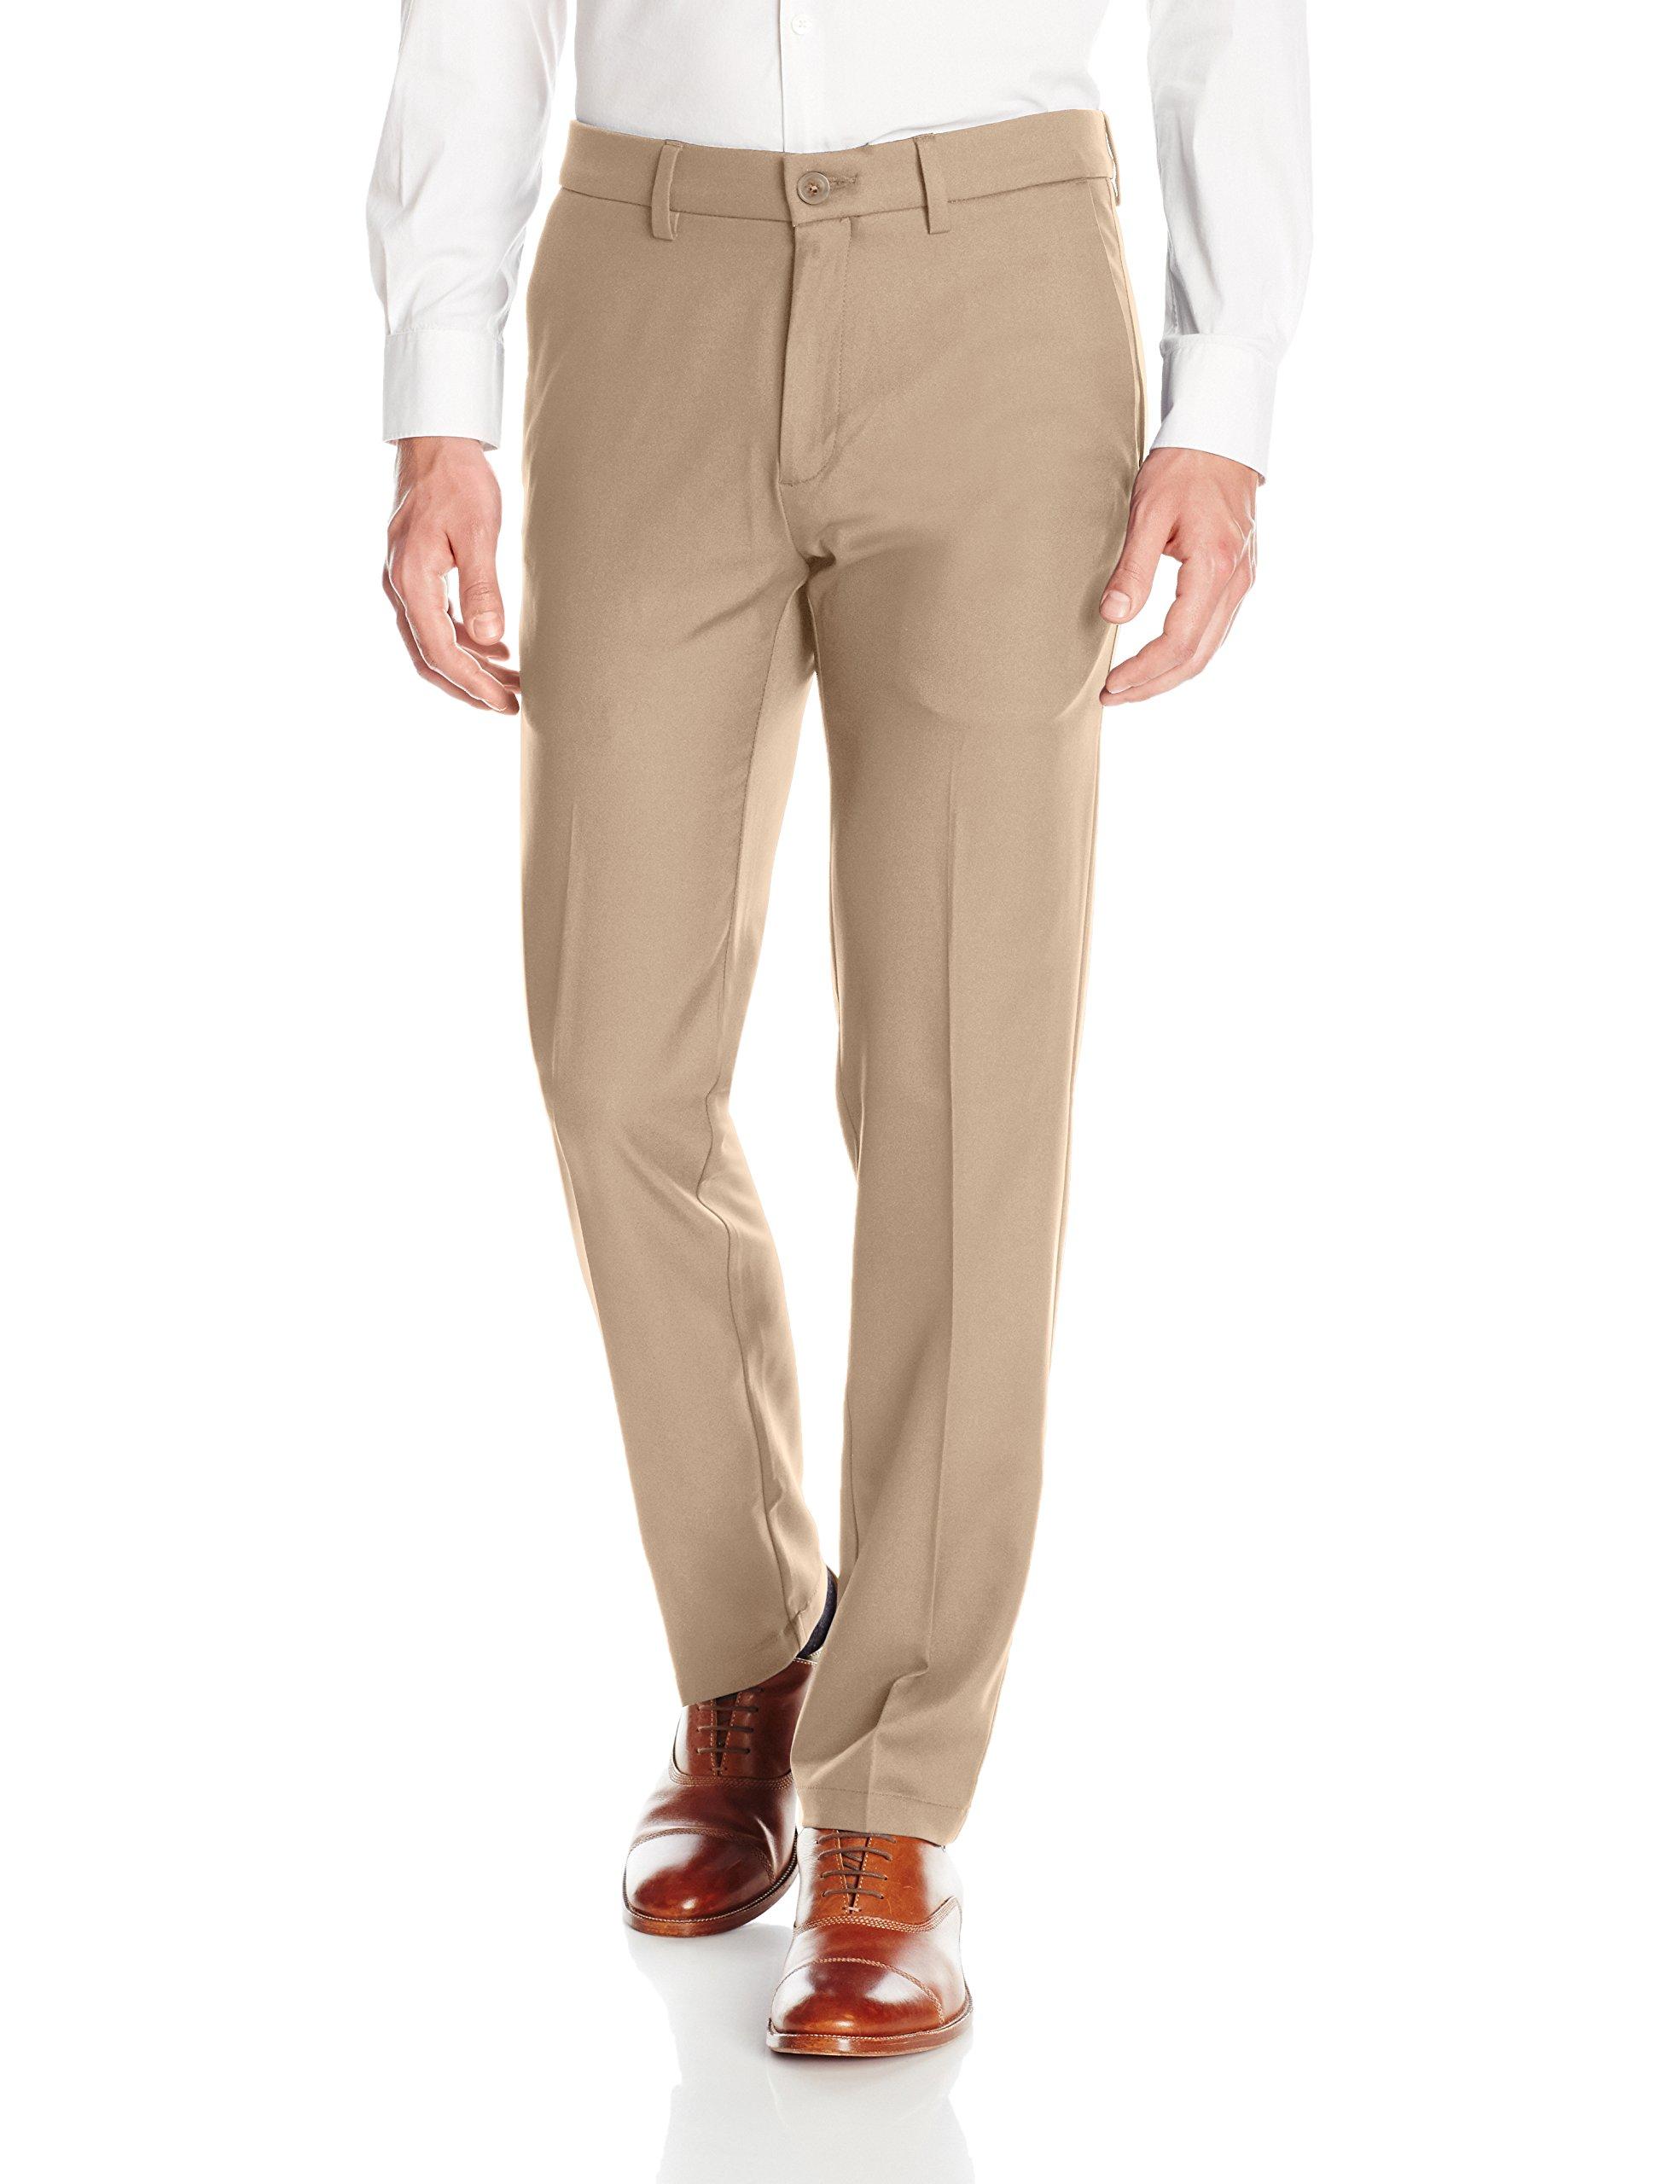 3b68cebd7c7 Haggar Men s Cool 18 Pro Straight Fit Flat Front Superflex Waistband Pant